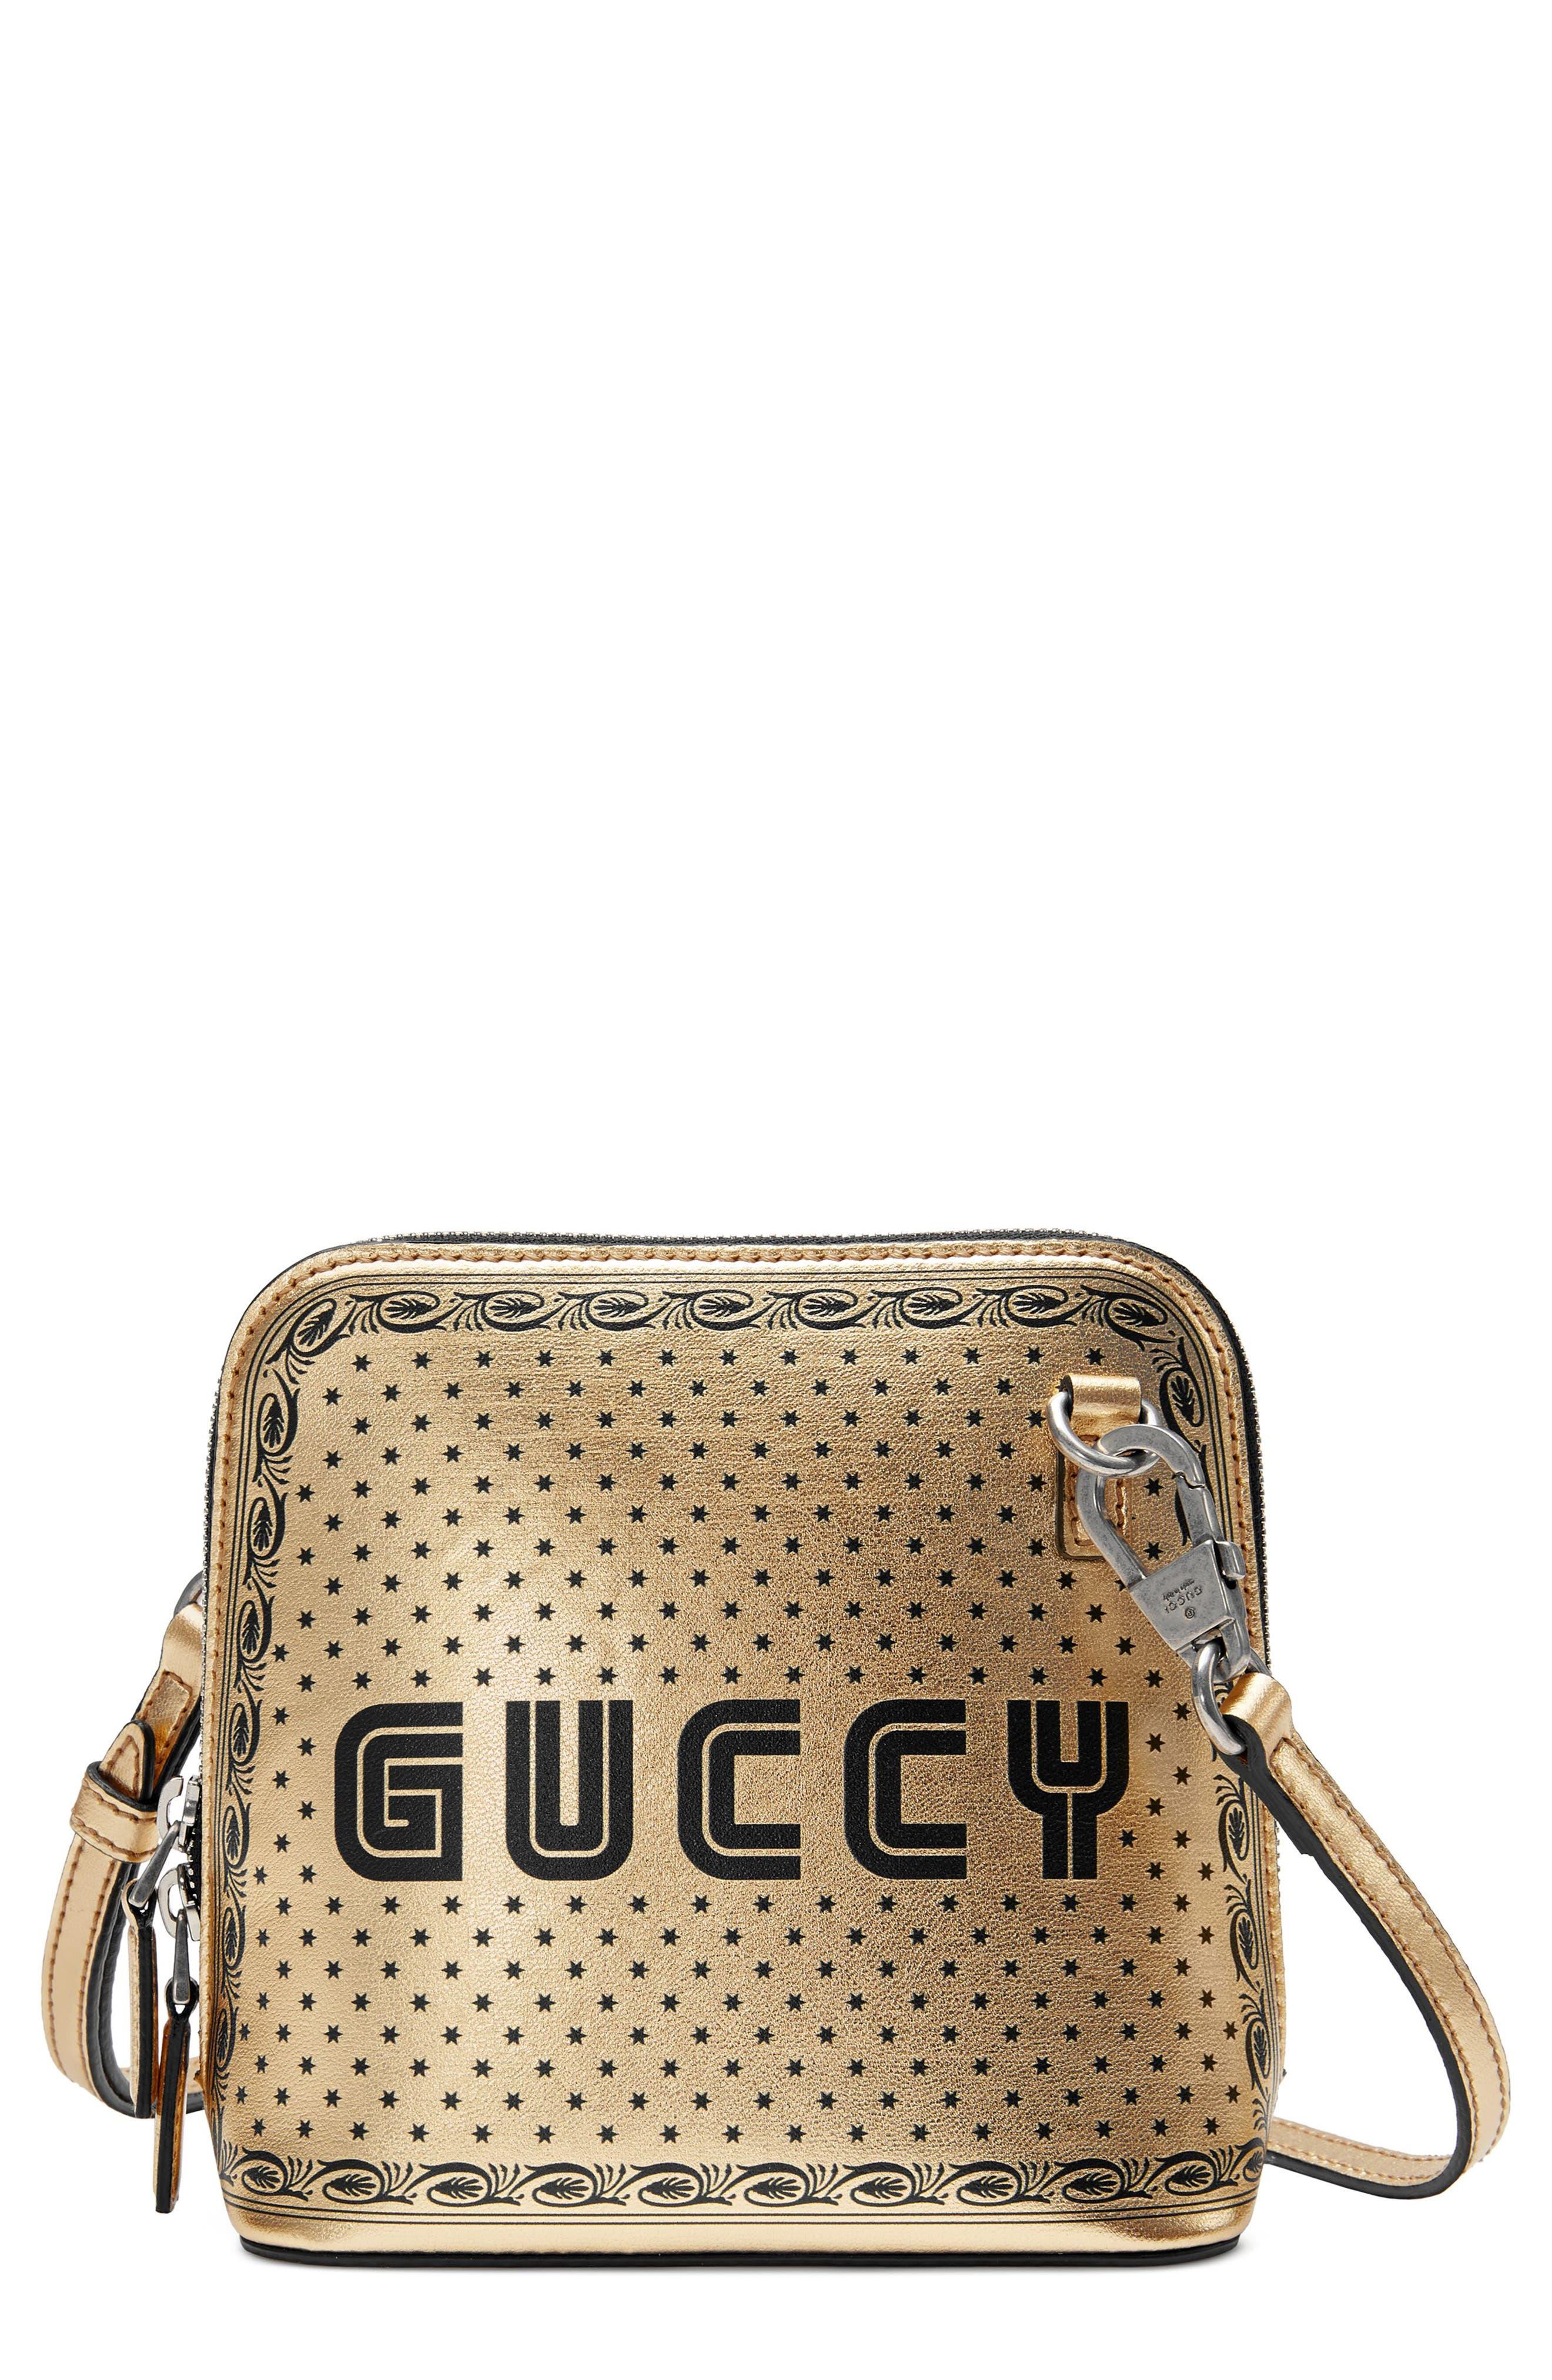 Guccy Logo Moon & Stars Leather Crossbody Bag,                         Main,                         color, ORO/ NERO